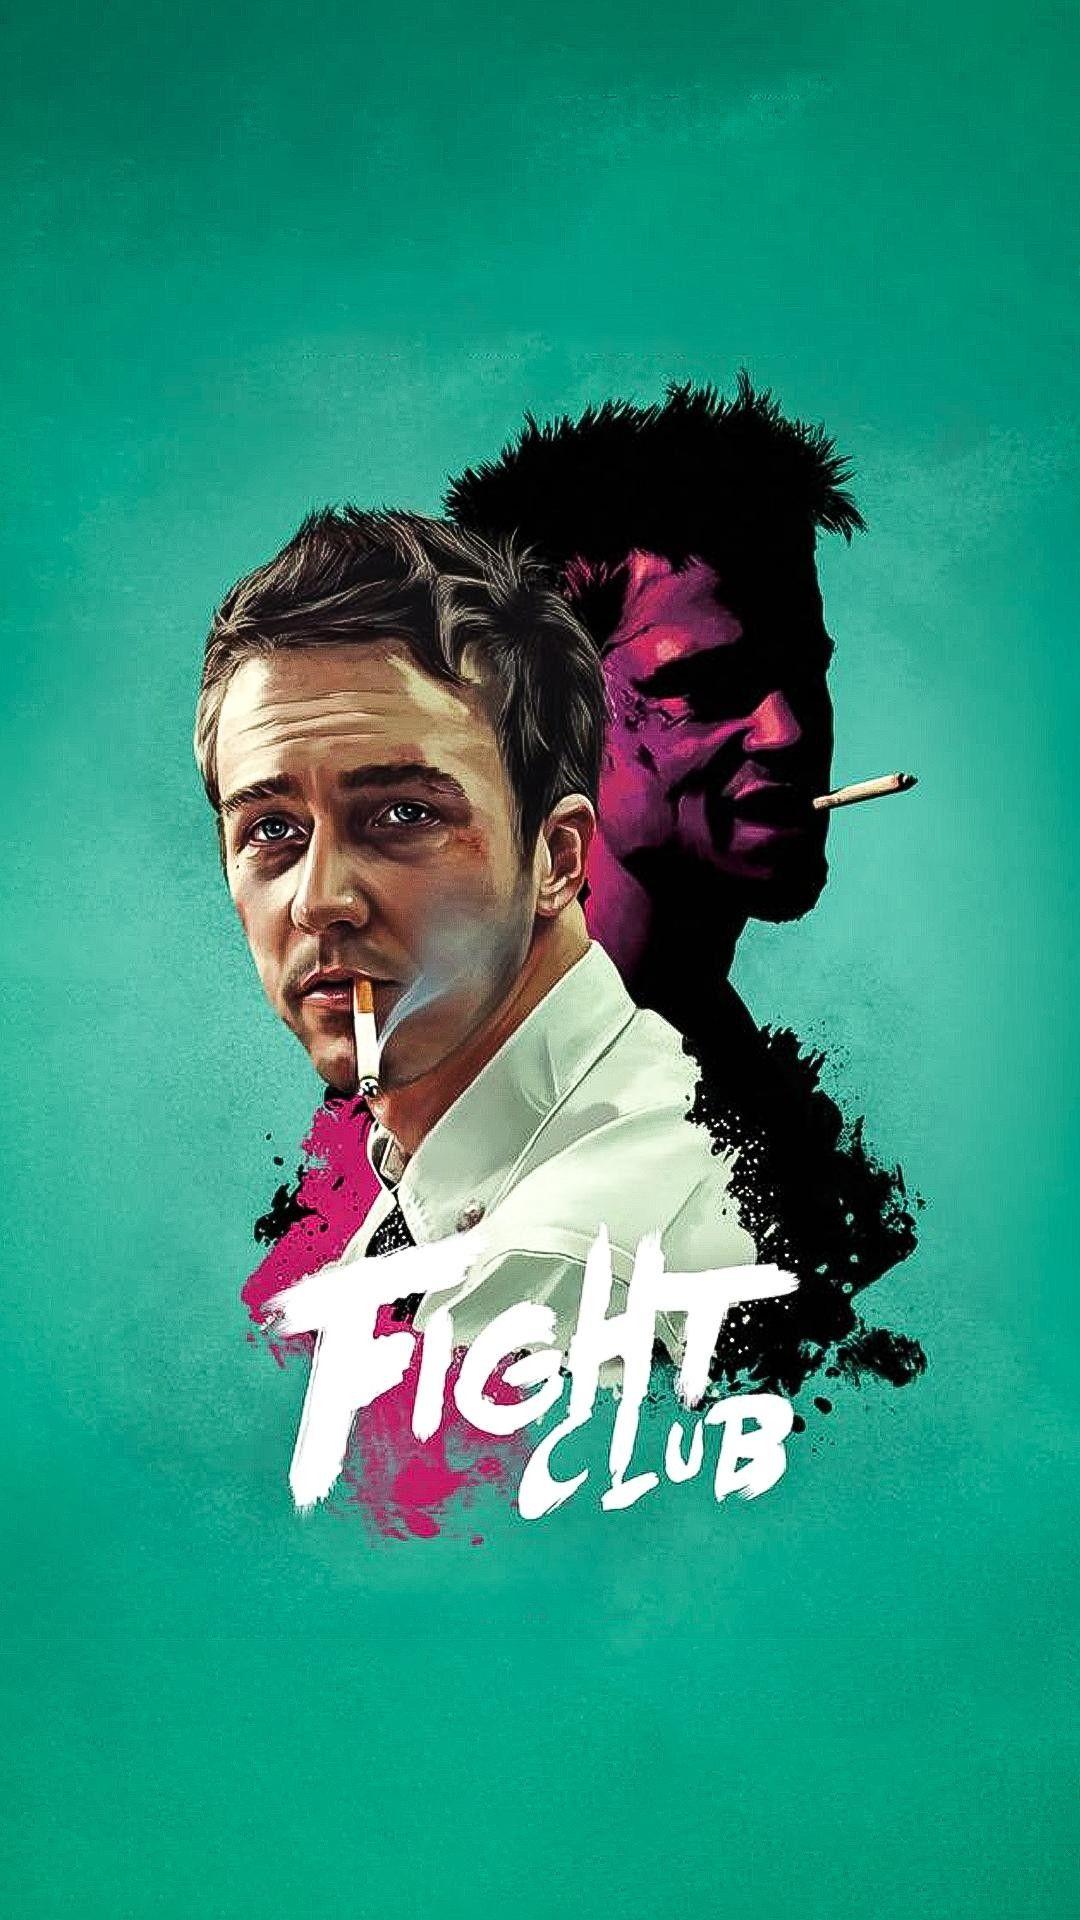 Pin On Fight Club